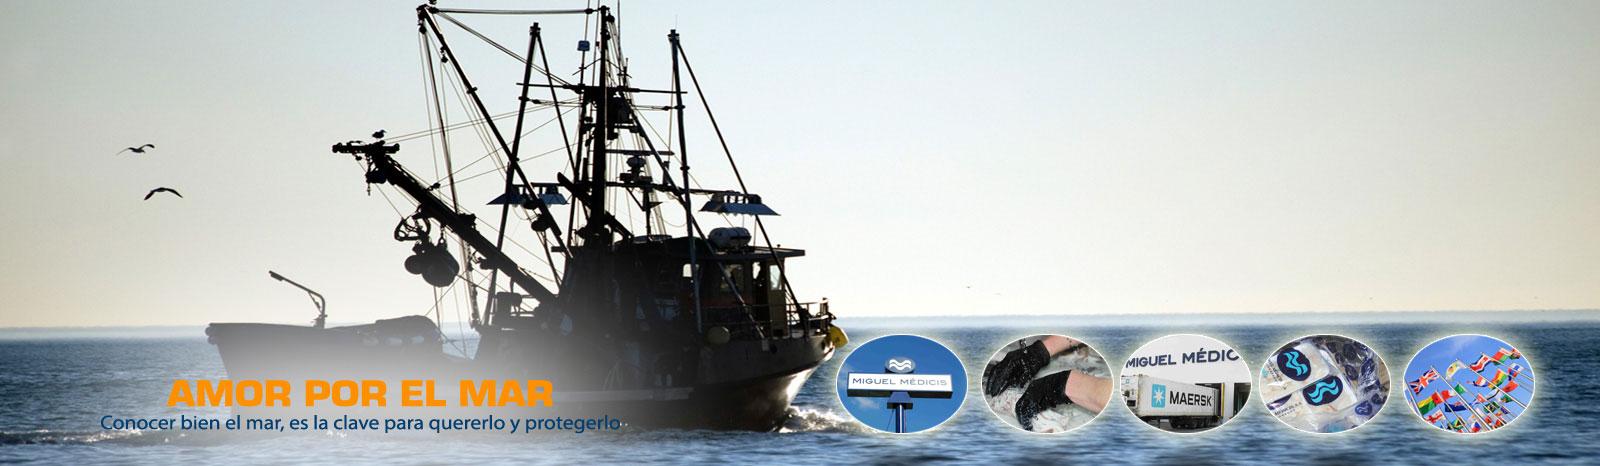 banner-barco2